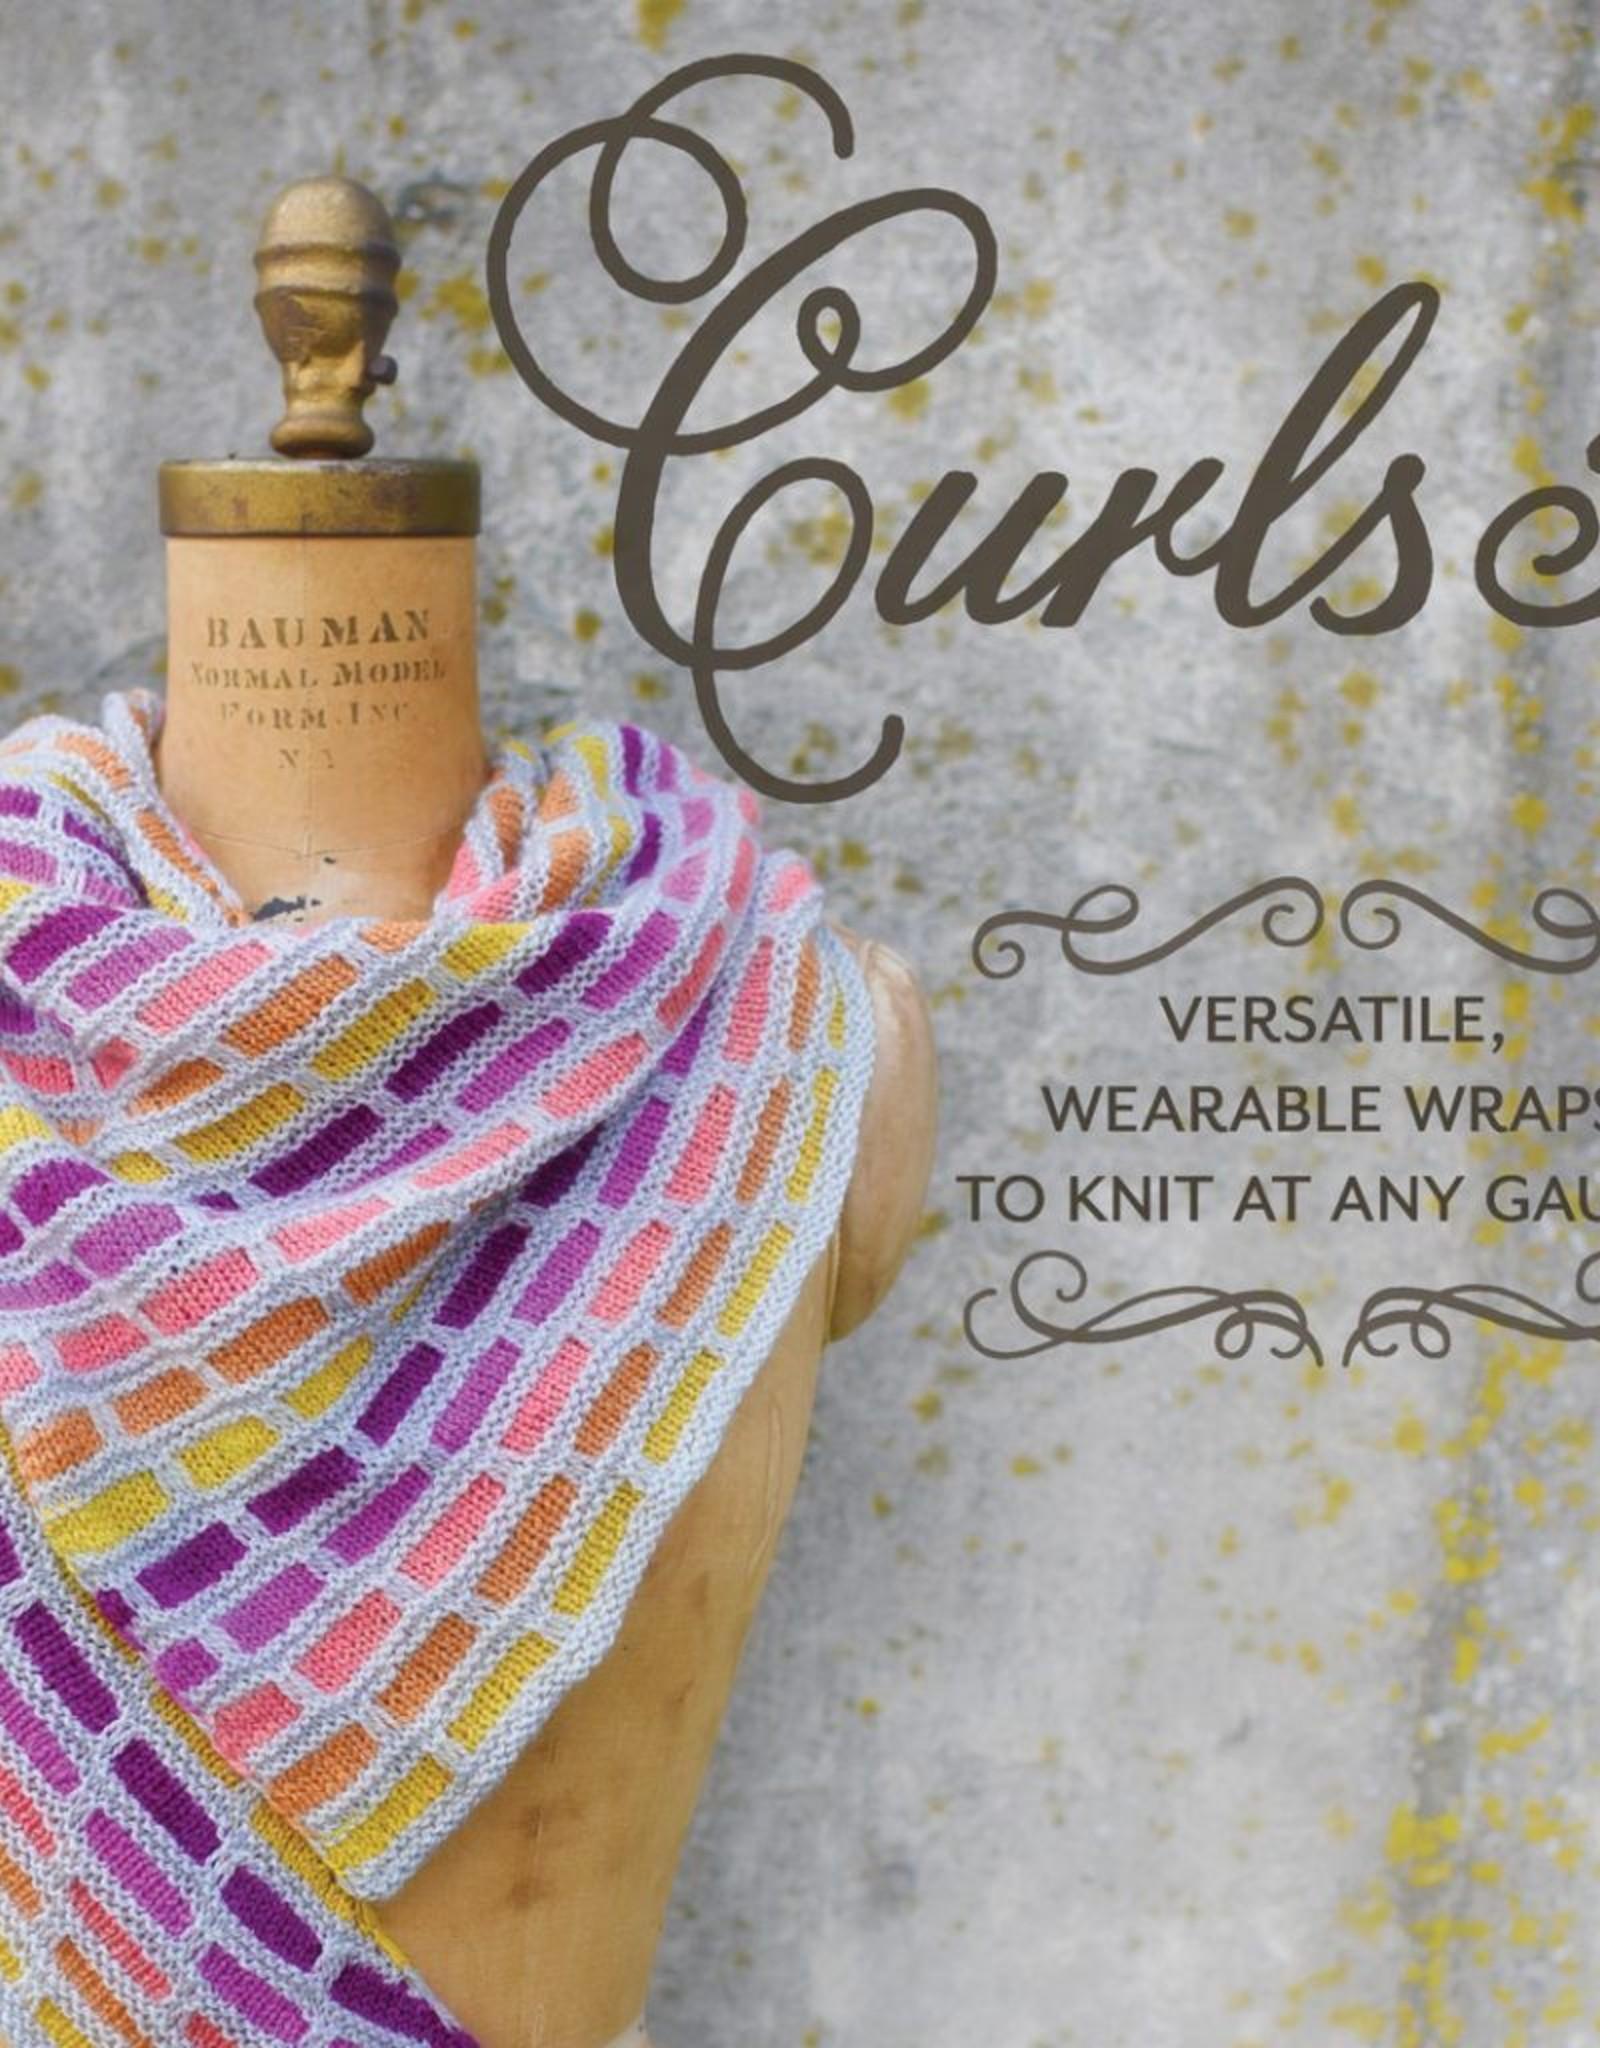 Pantsville Press Curls 3: Versatile, Wearable Wraps to Knit any Gauge